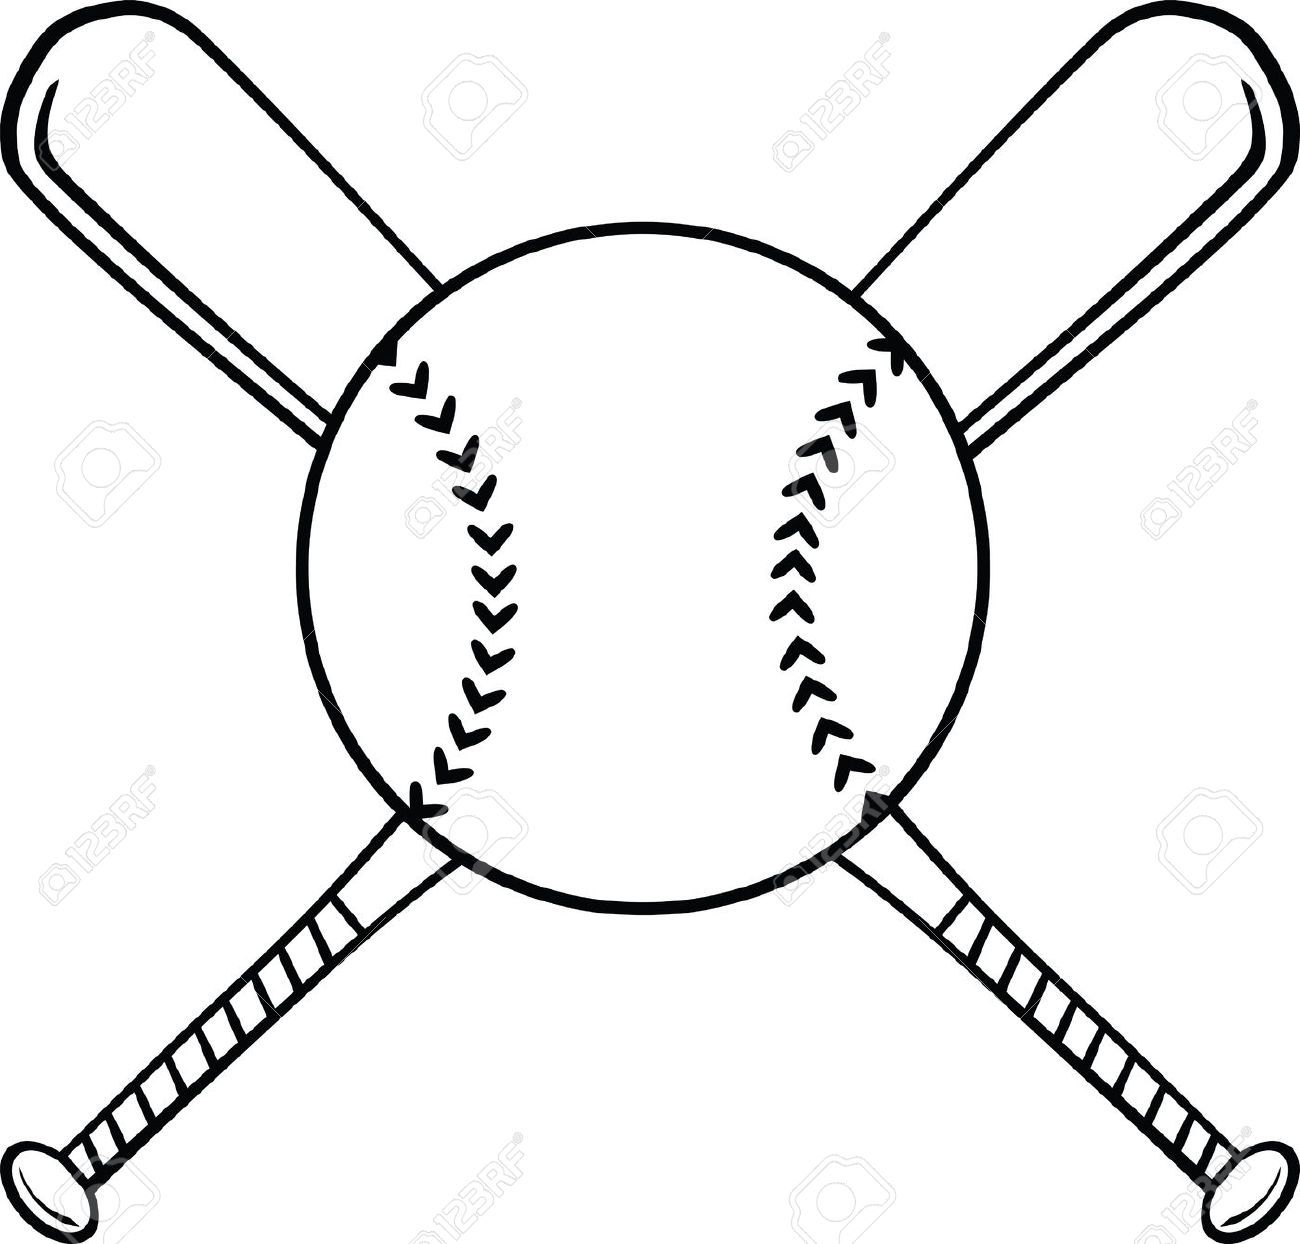 small resolution of softball ball and bat clipart clipartfox